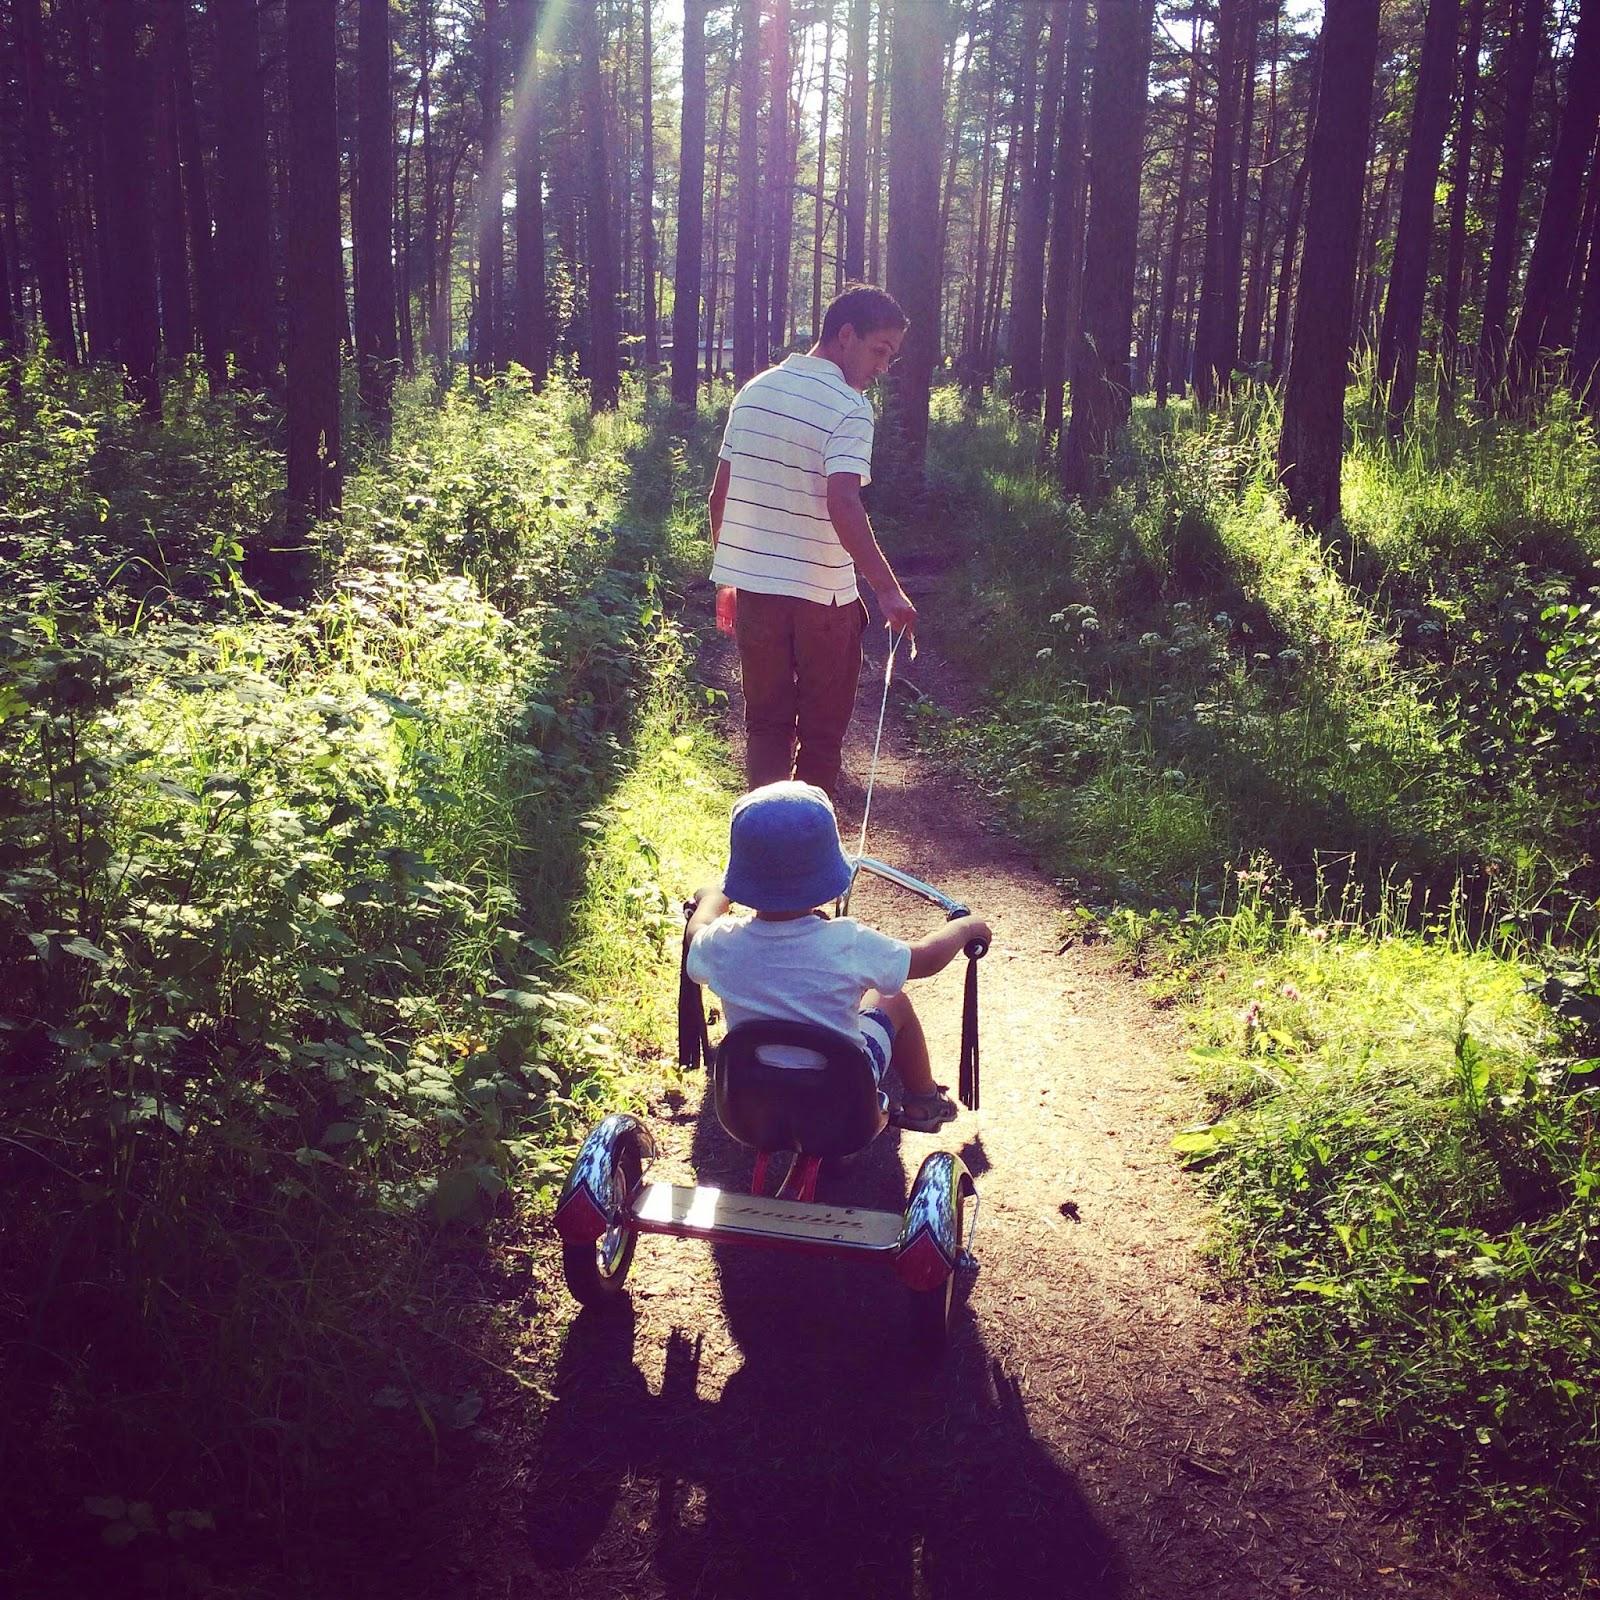 schwinn tricycle toddler bike